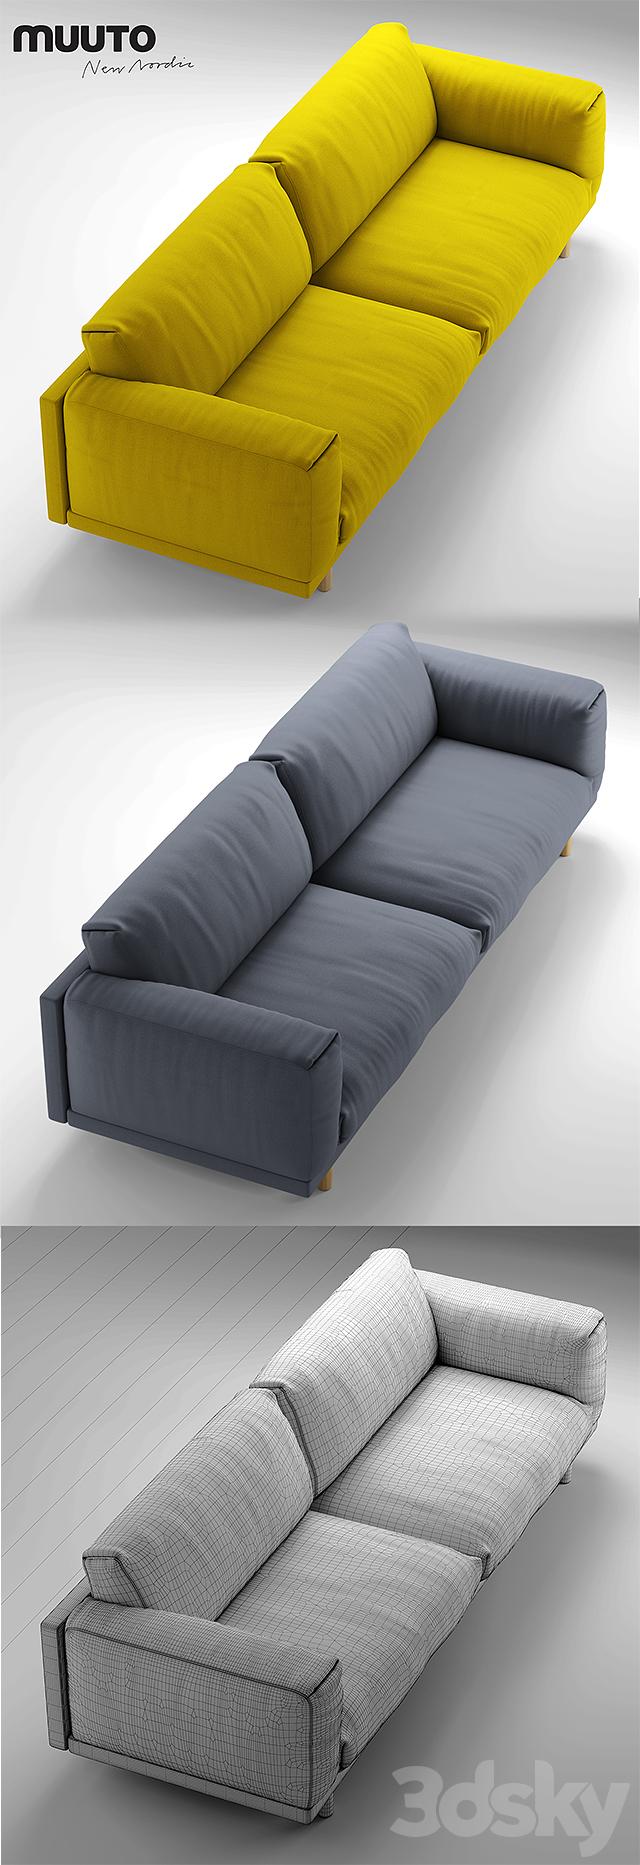 3d models sofa muuto rest sofa 3 seater sofa. Black Bedroom Furniture Sets. Home Design Ideas